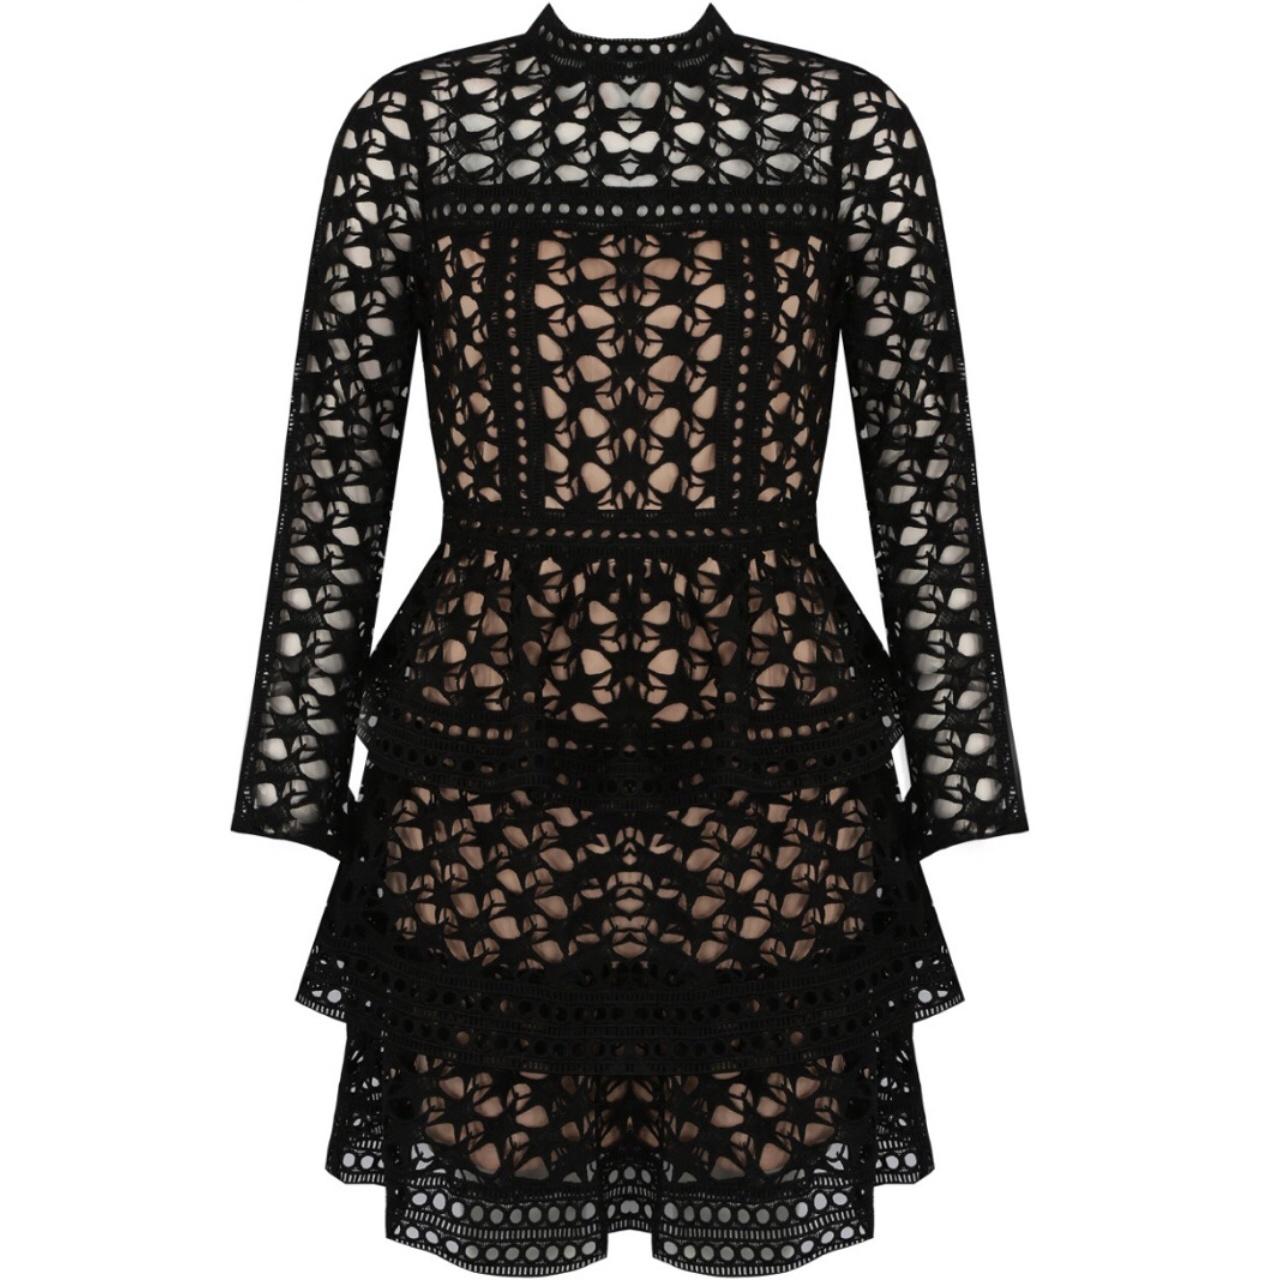 Lily Mcbee Star Dress